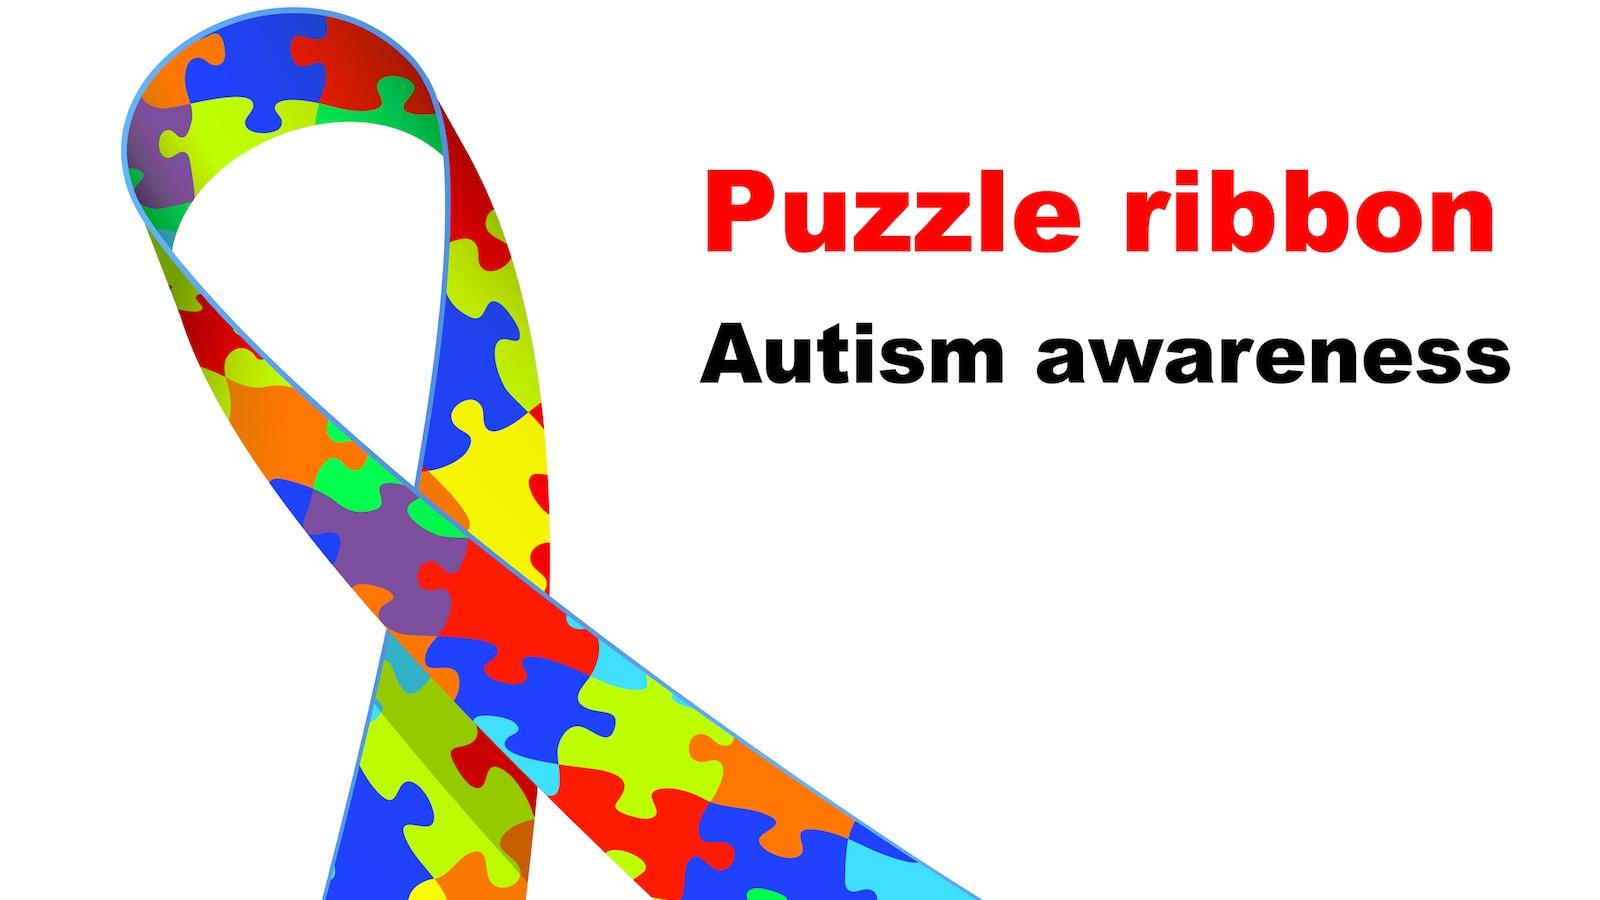 Puzzle clipart social skill Autism awareness researchers  develop